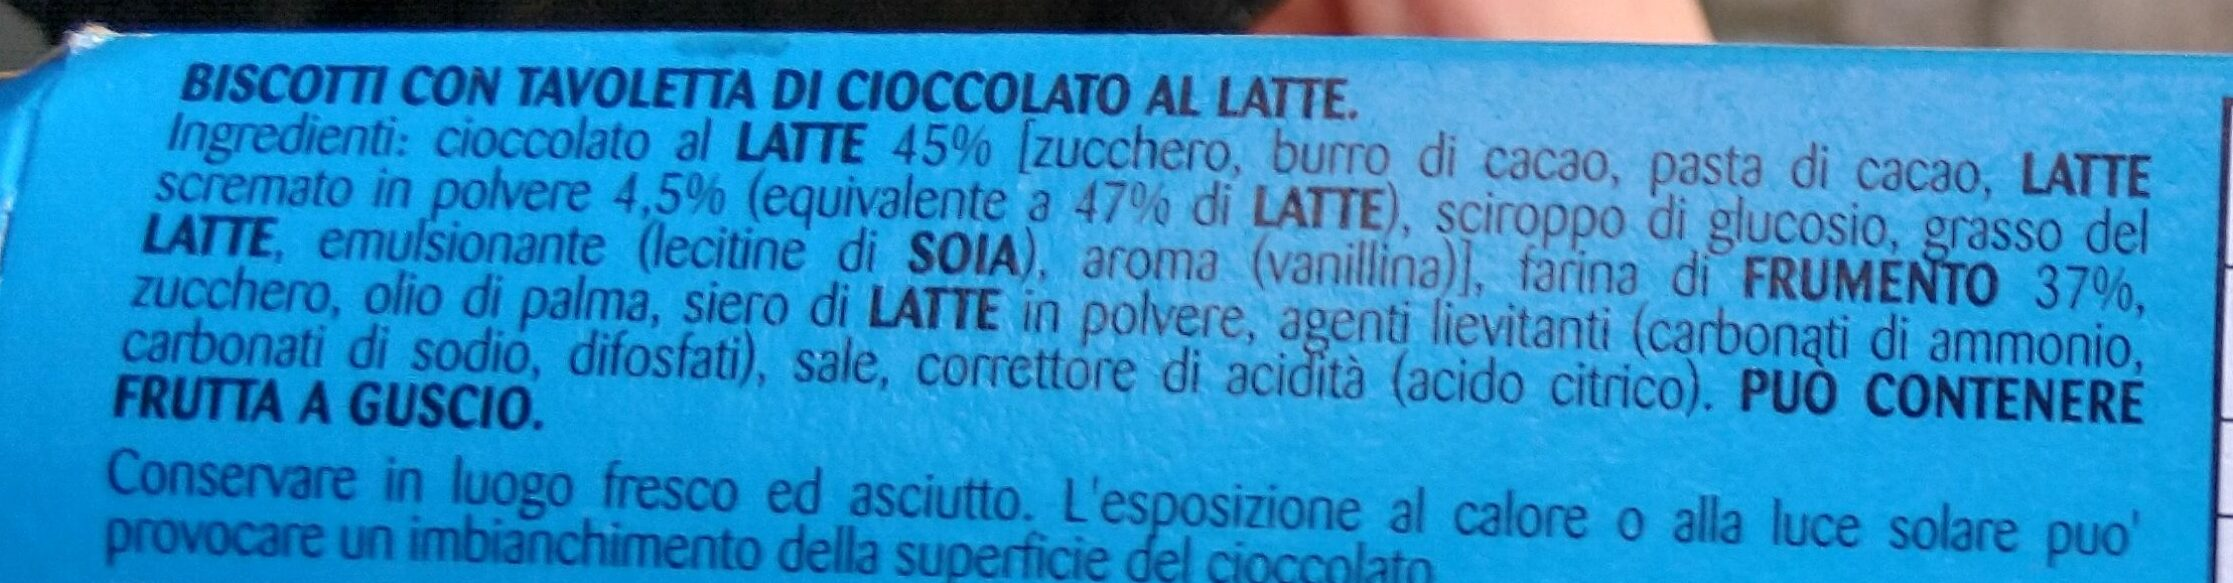 Oro Ciok Cioccolato Al Latte 250G - Ingredienti - it